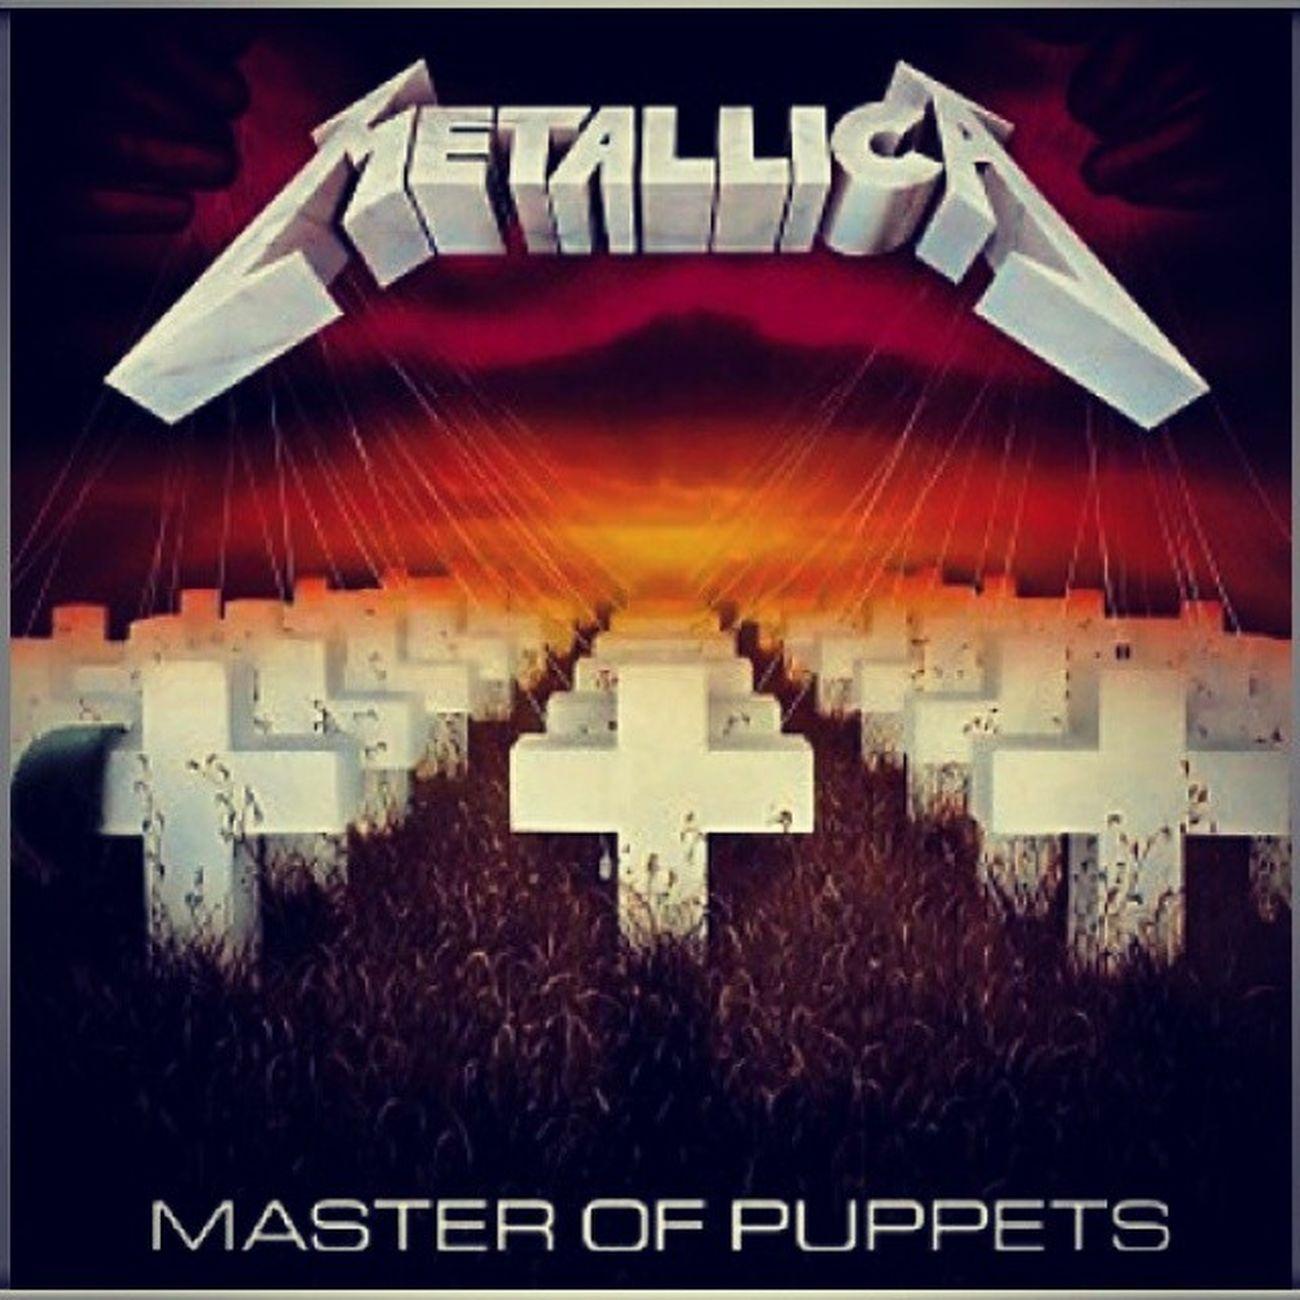 Metallica JamesHetfield Roberttrujillo Kirkhammett larsulrich masterofpuppets love favoriteband